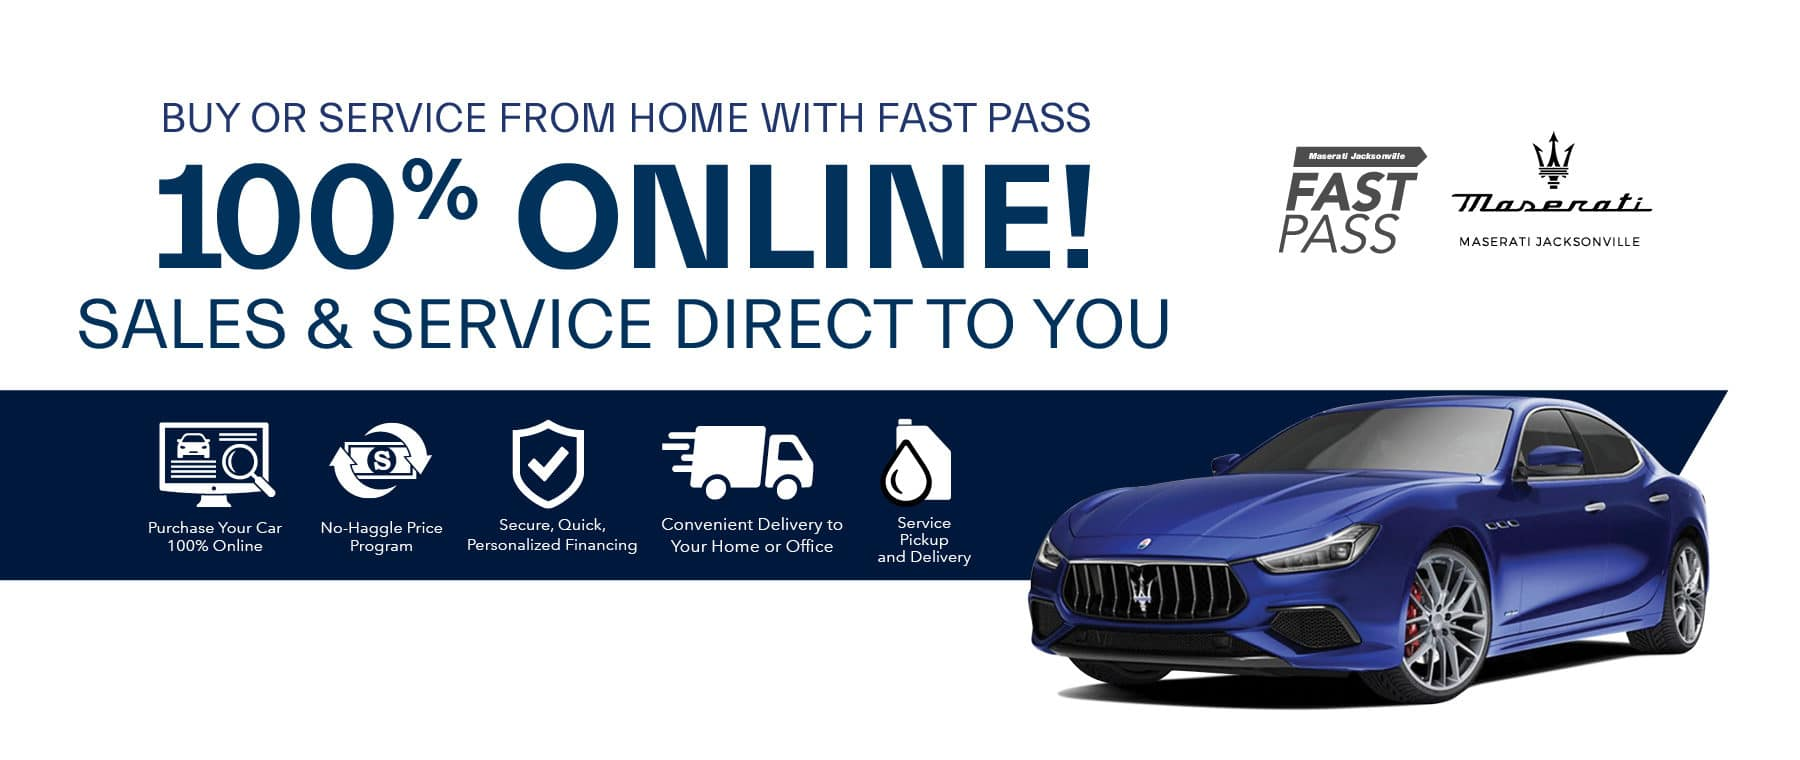 Fast Pass 100% Online Shopping